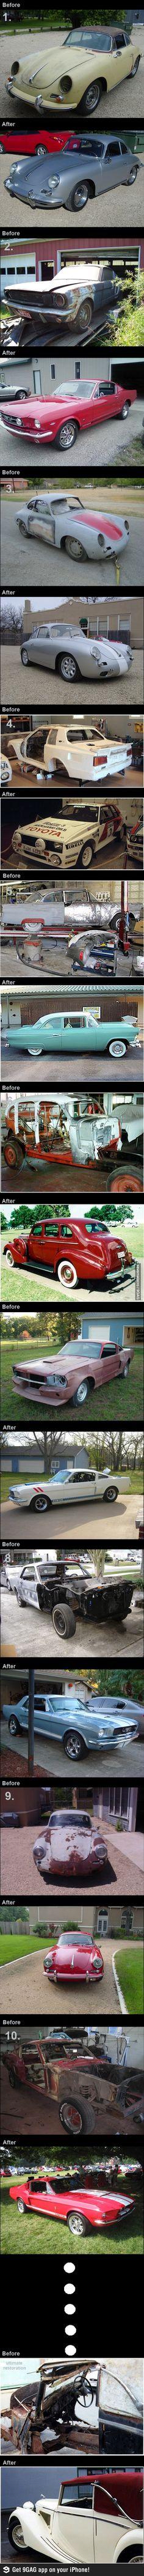 Amazing car restorations